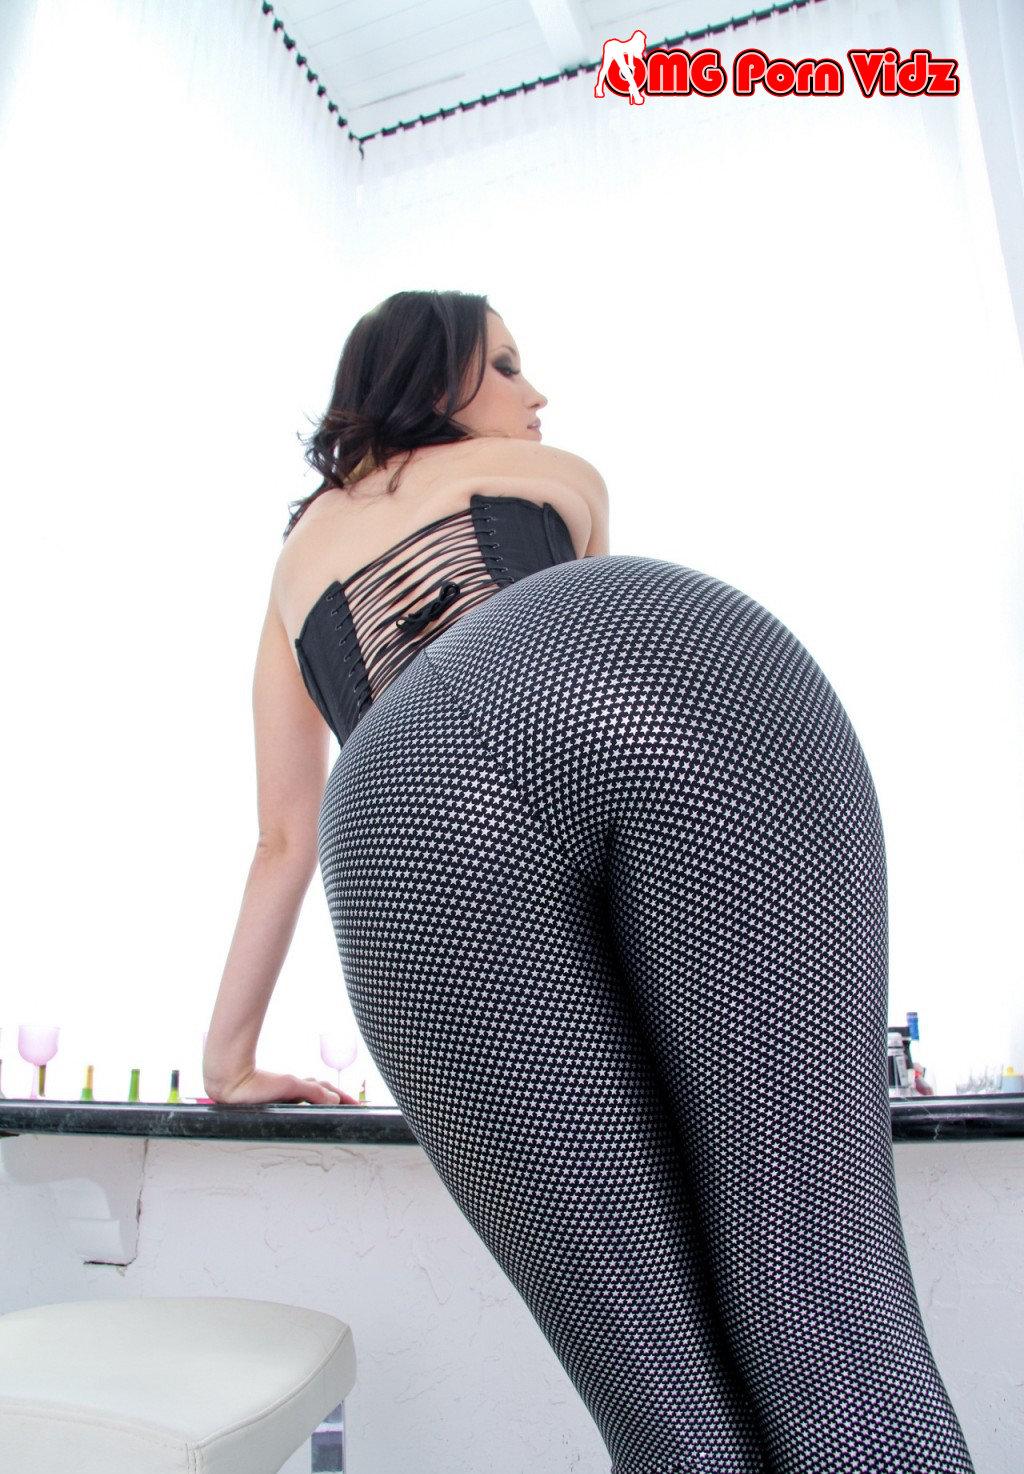 Hustler Karmen Bella Super Hero Pornstar Ig Sex HD Pics